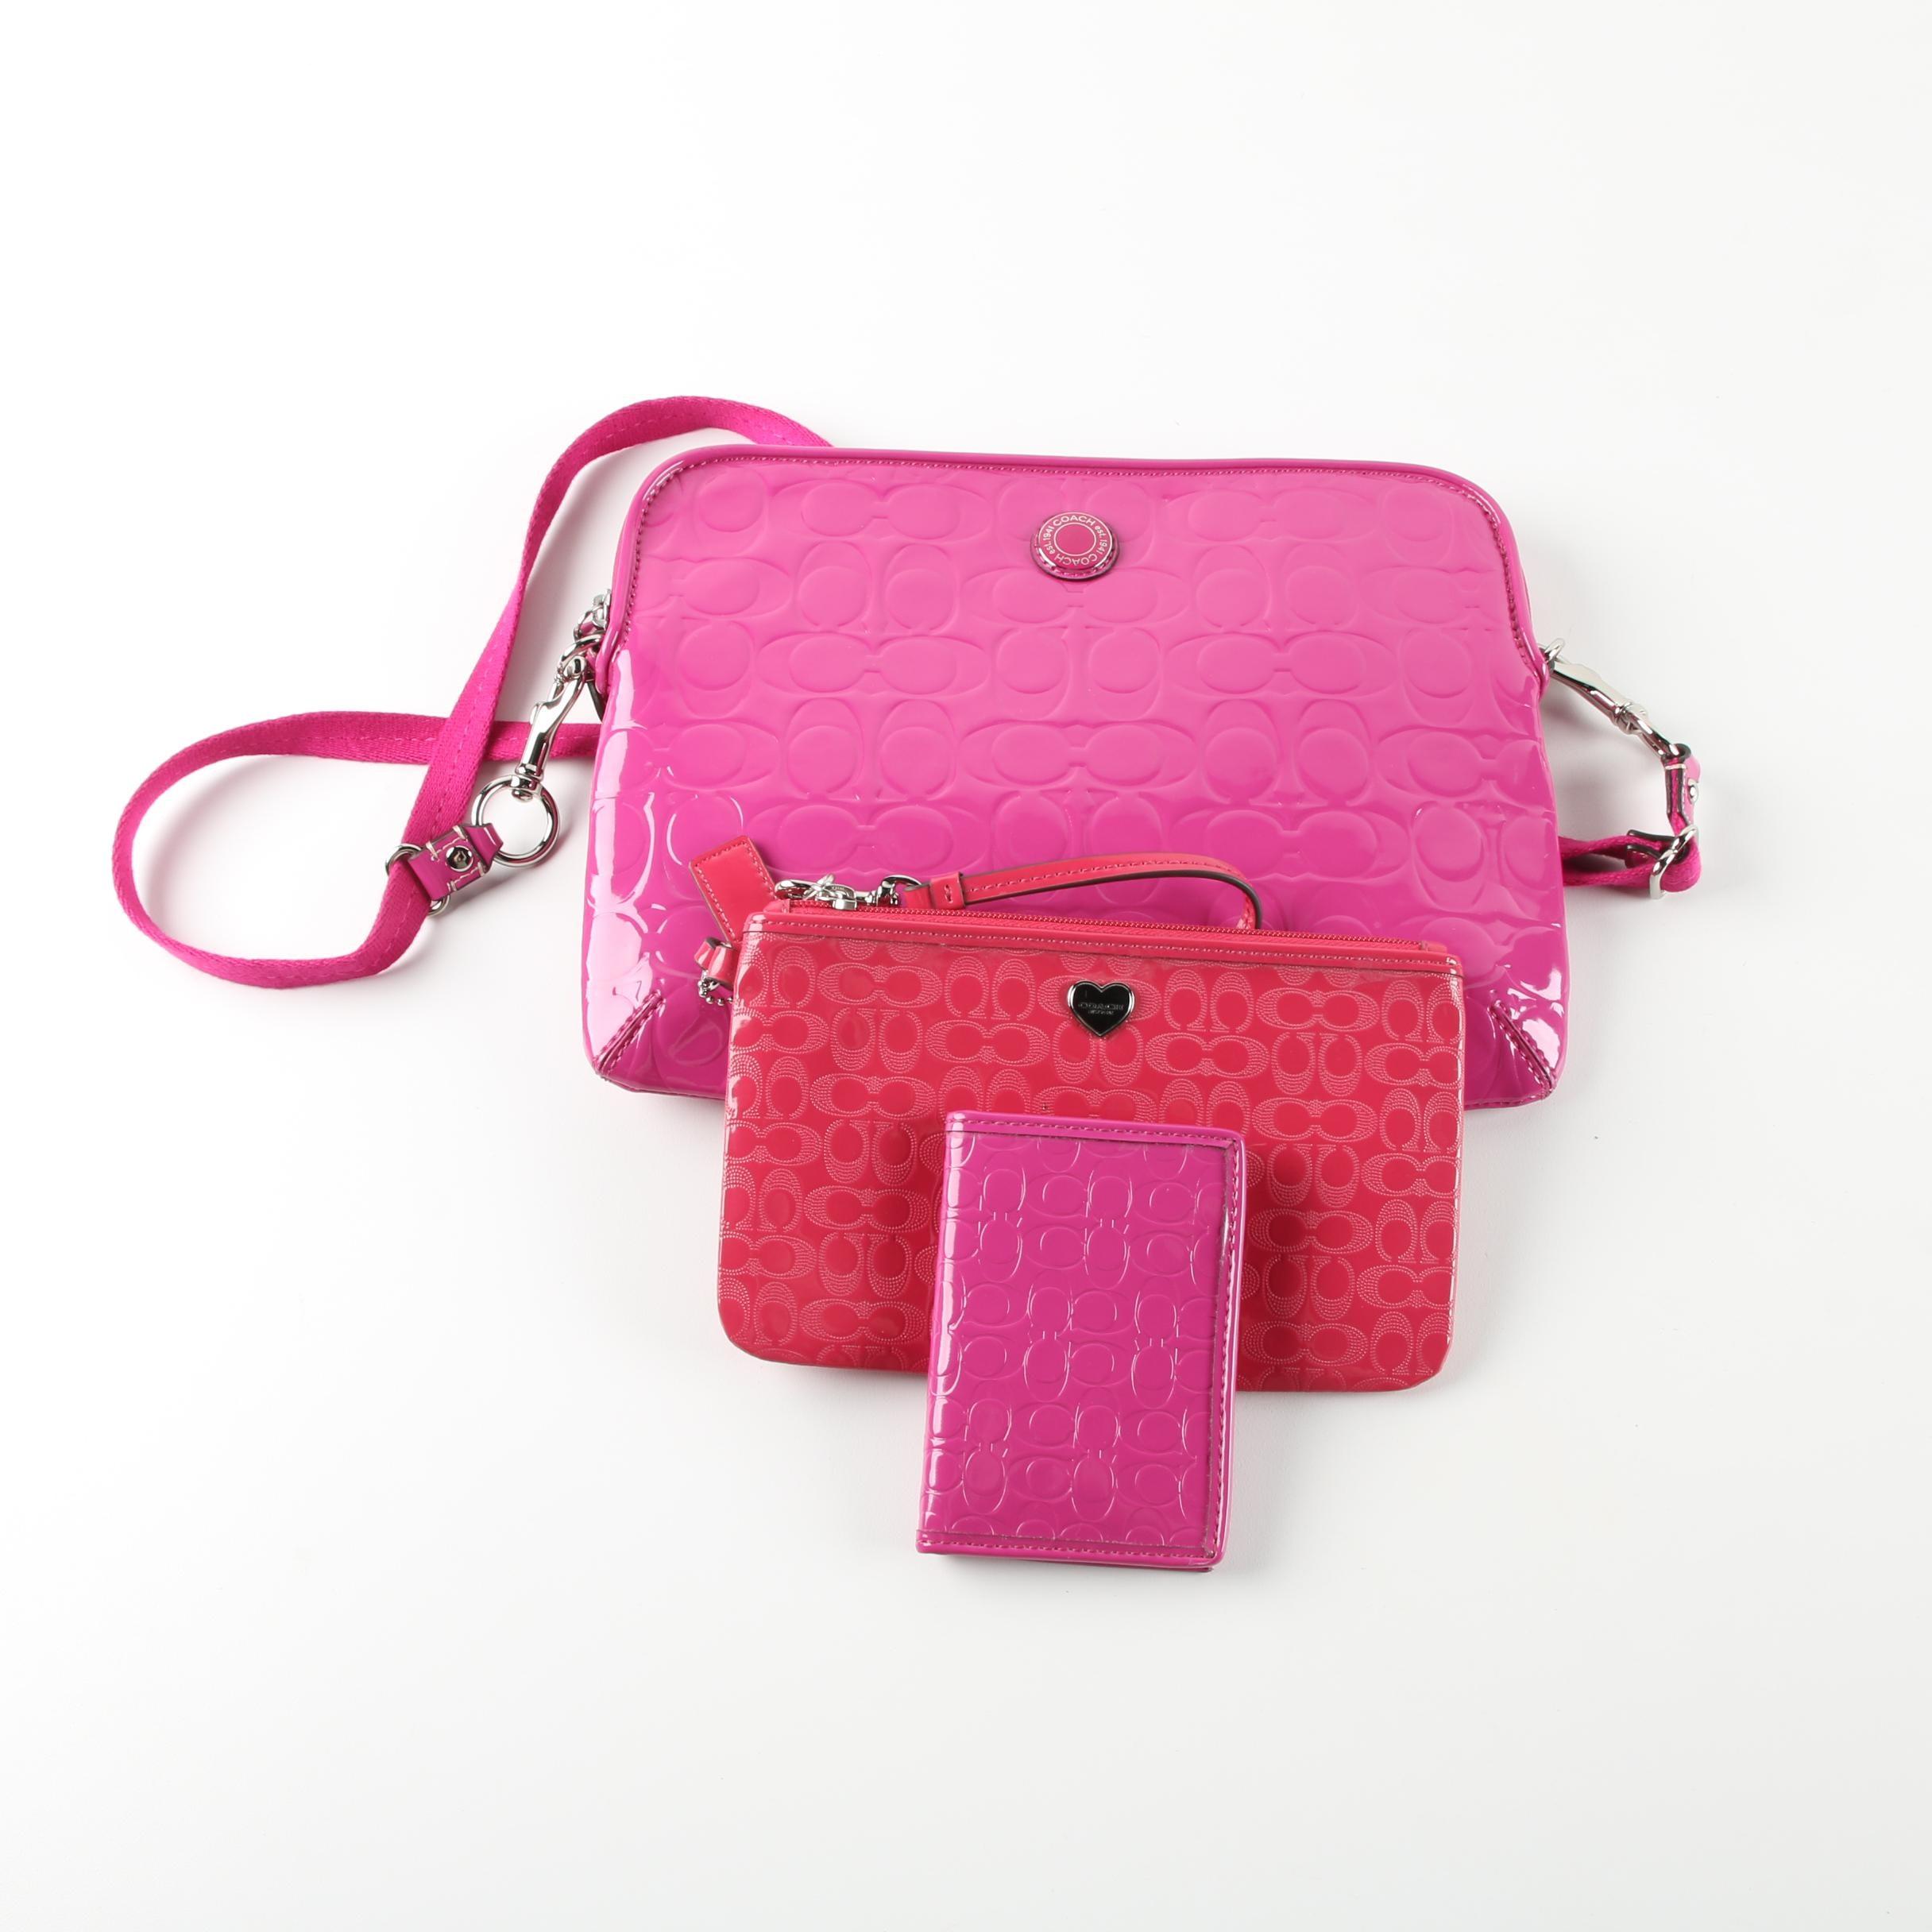 Coach Monogram Pink Patent Leather Shoulder Bag, Wristlet, and Card Case